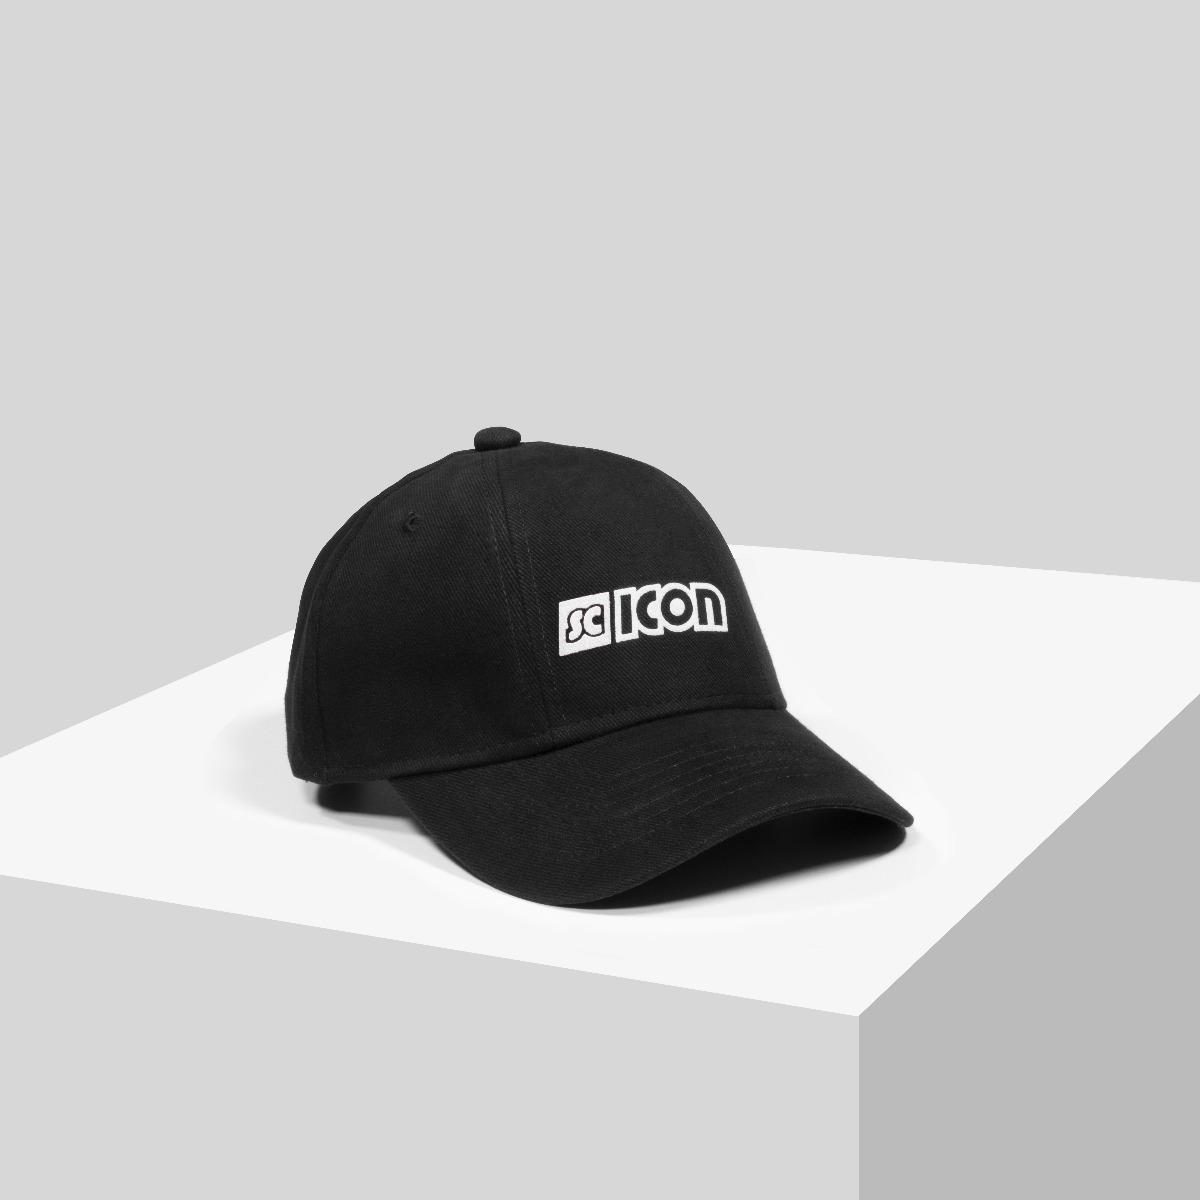 SQUADRA BASEBALL CAP 05